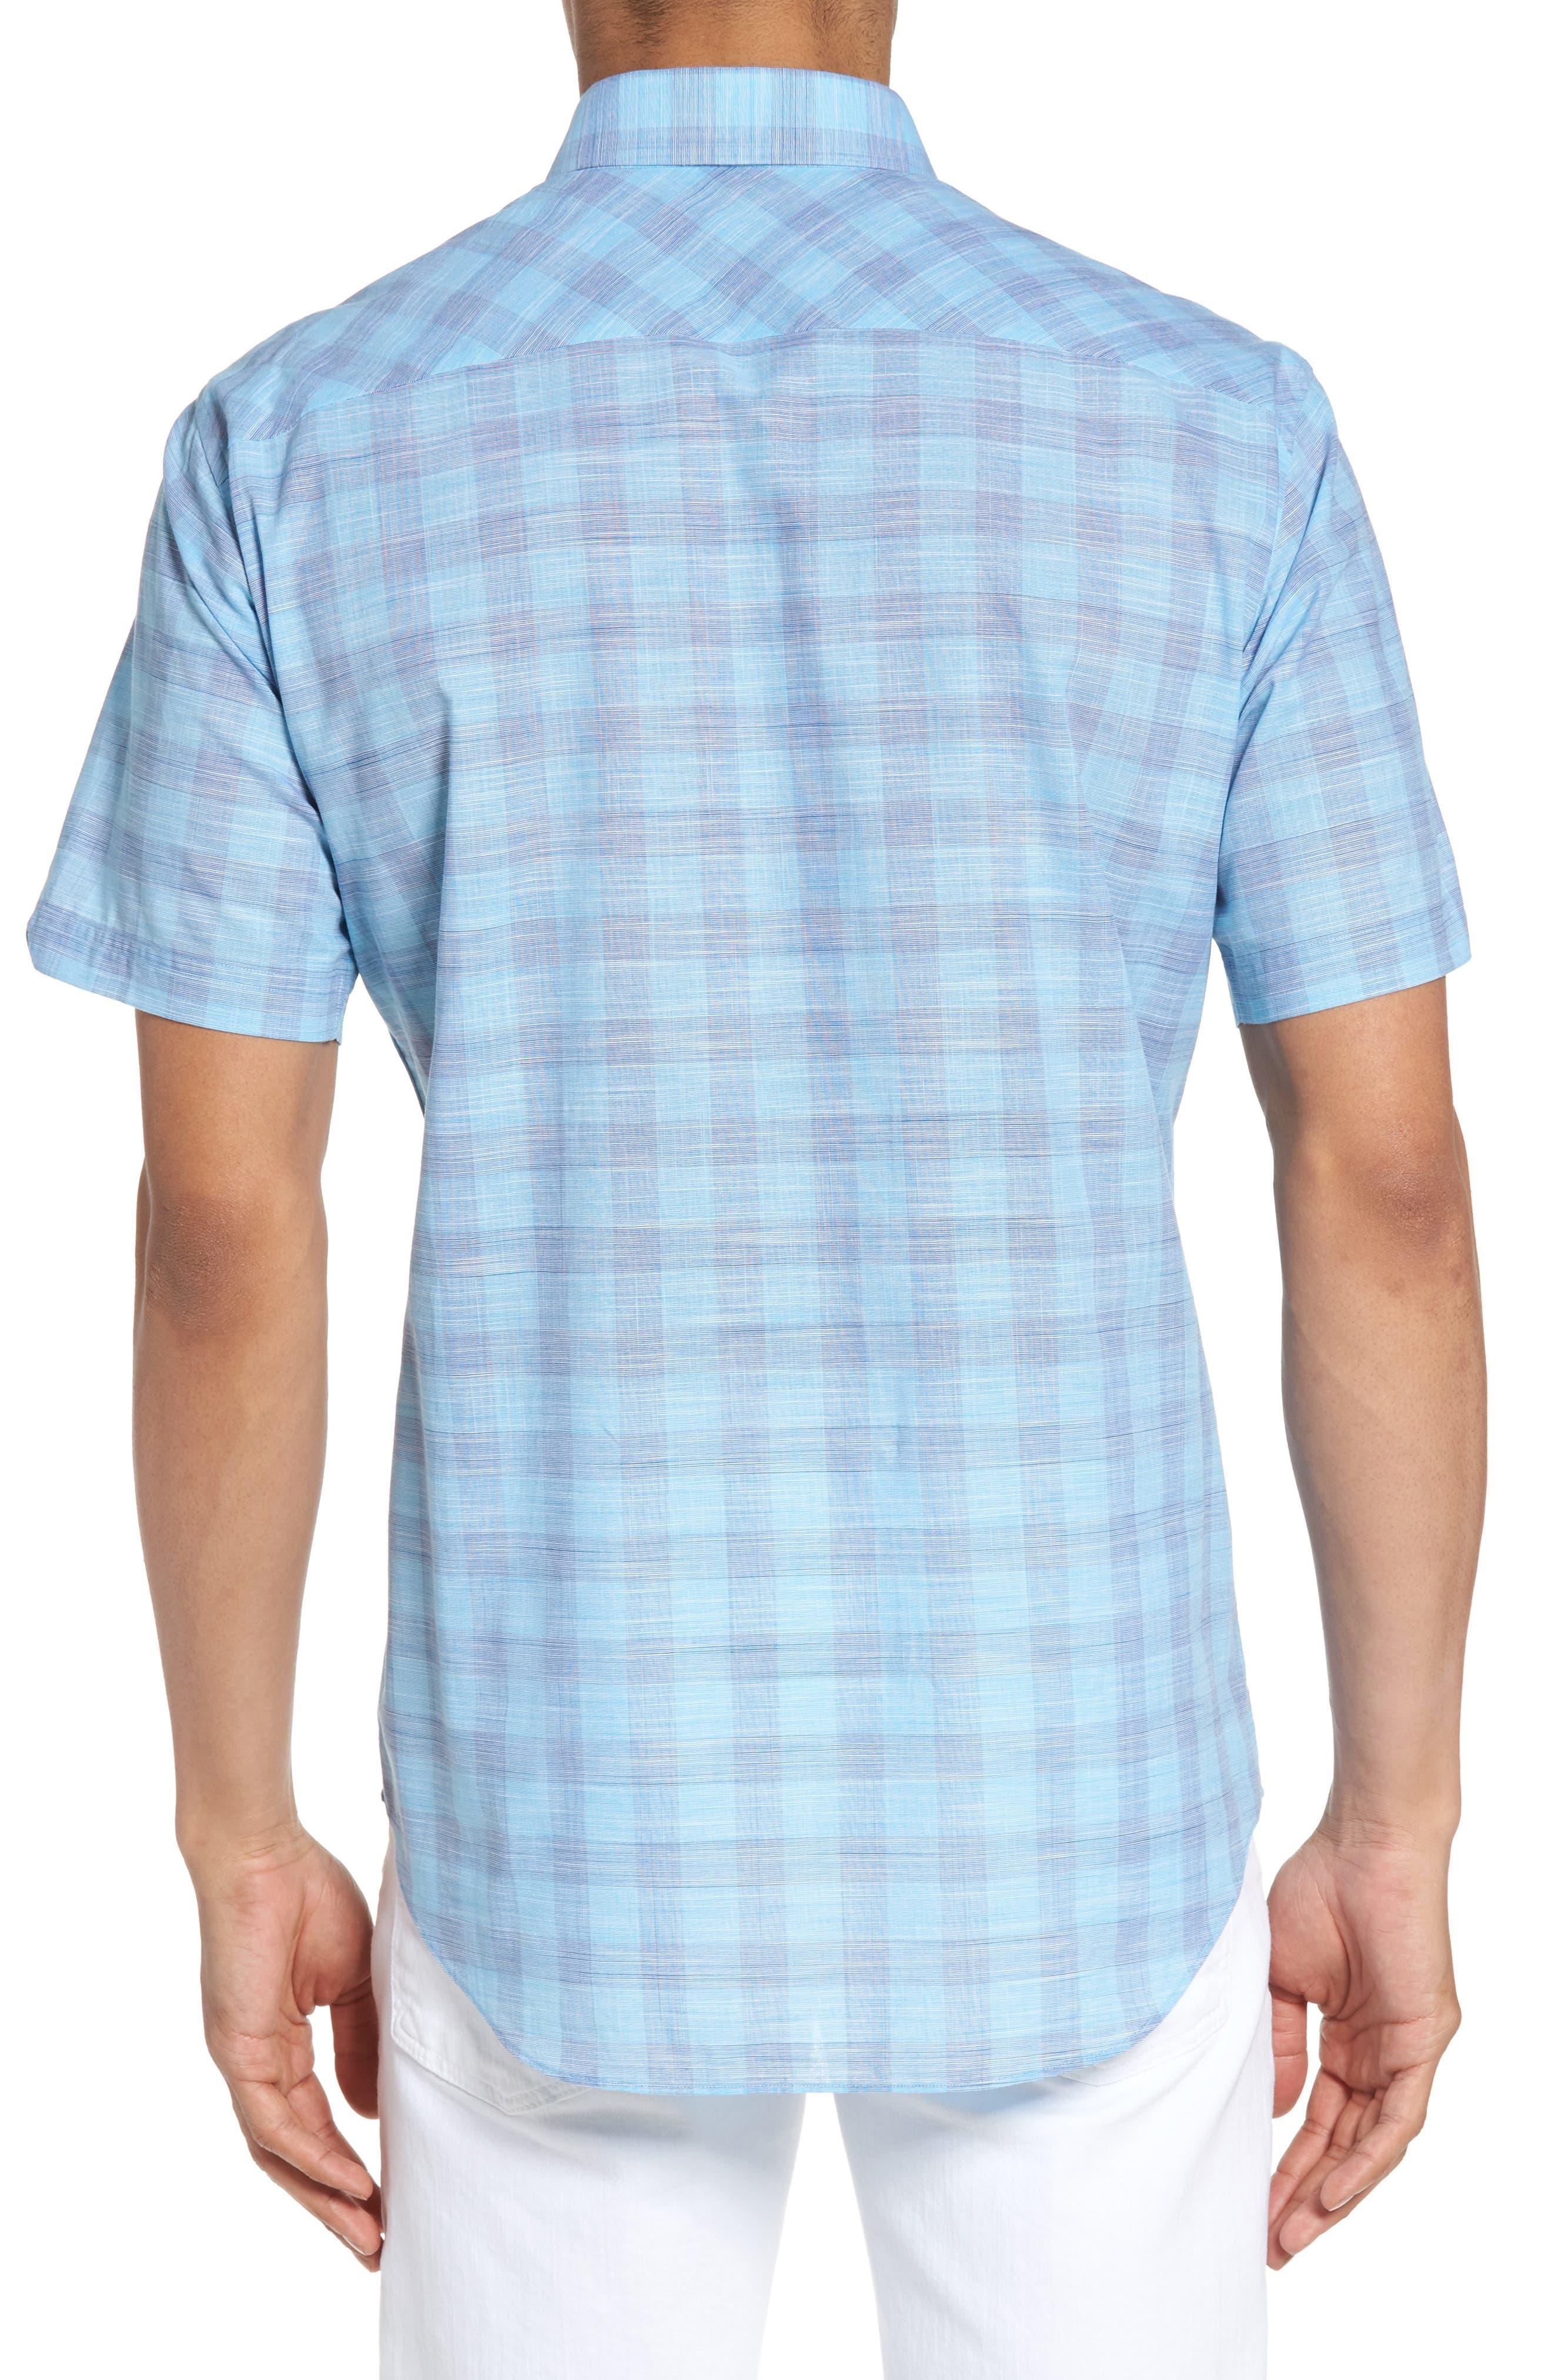 Hasanagic Trim Fit Plaid Sport Shirt,                             Alternate thumbnail 2, color,                             Turquoise